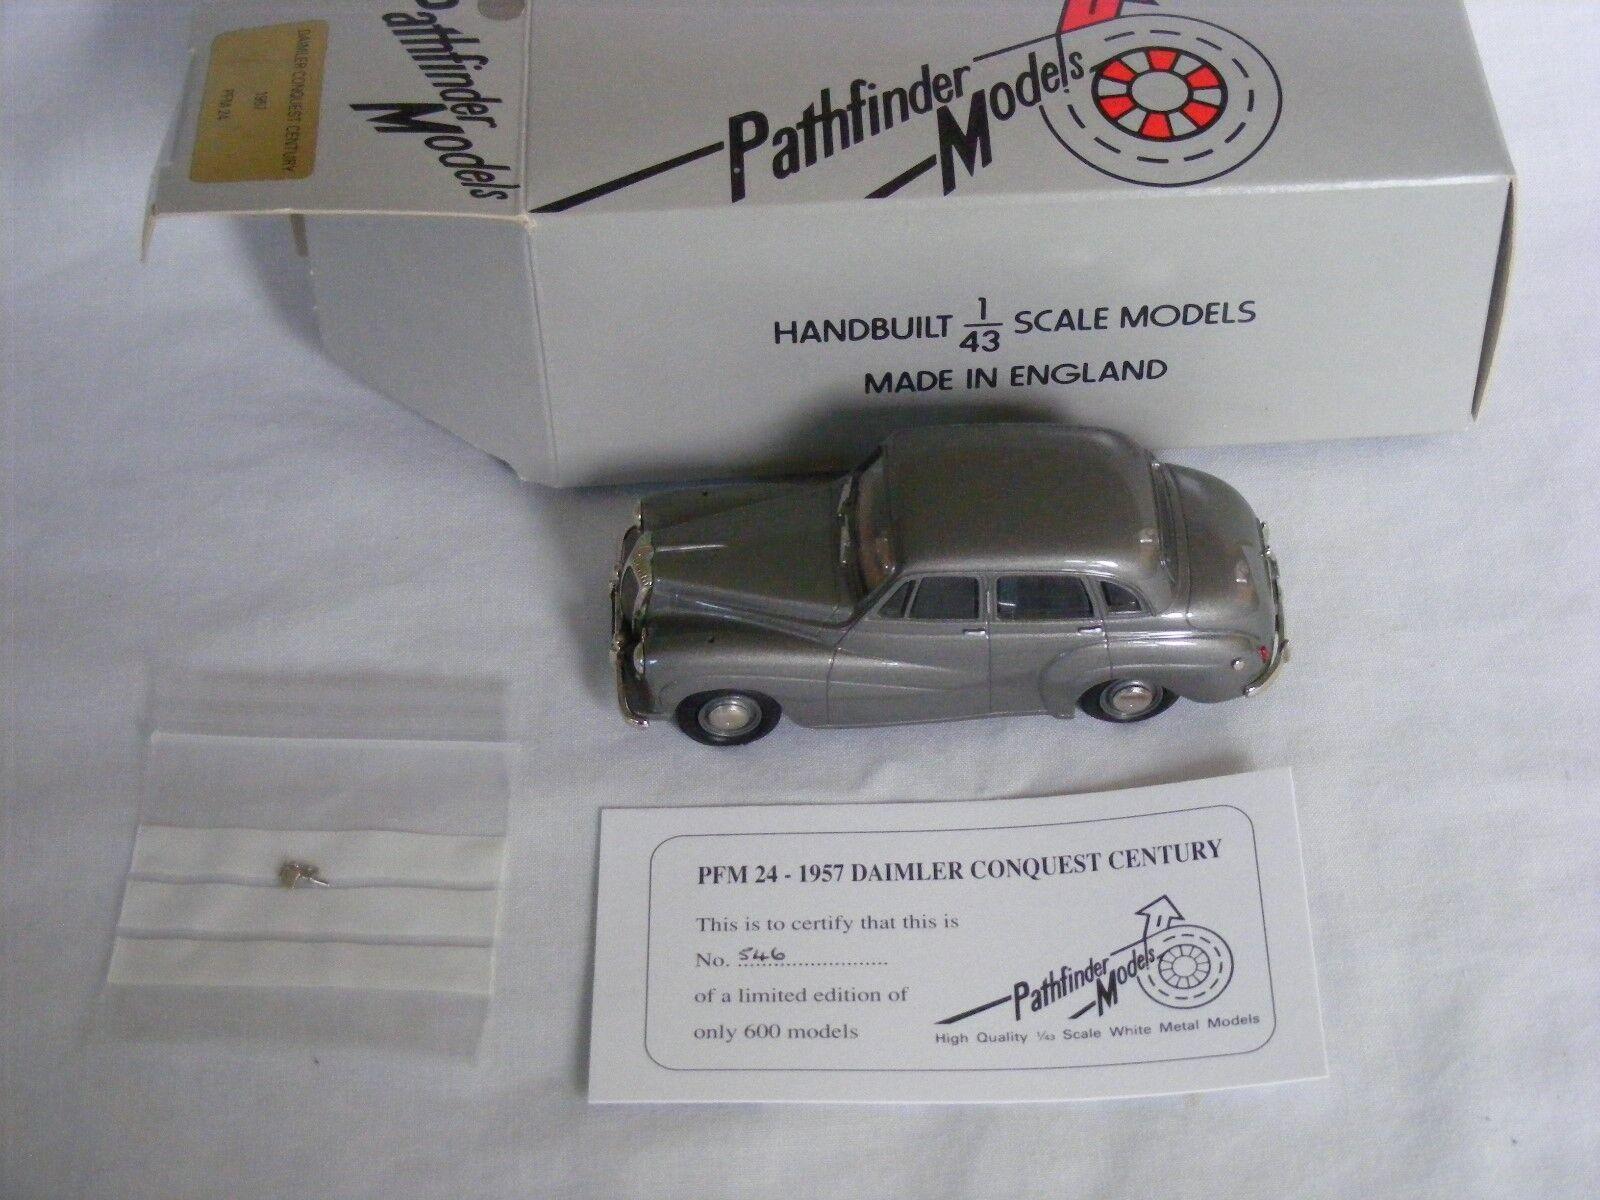 1957 Daimler Conquest Century - 1 43 Scale-Pathfinder